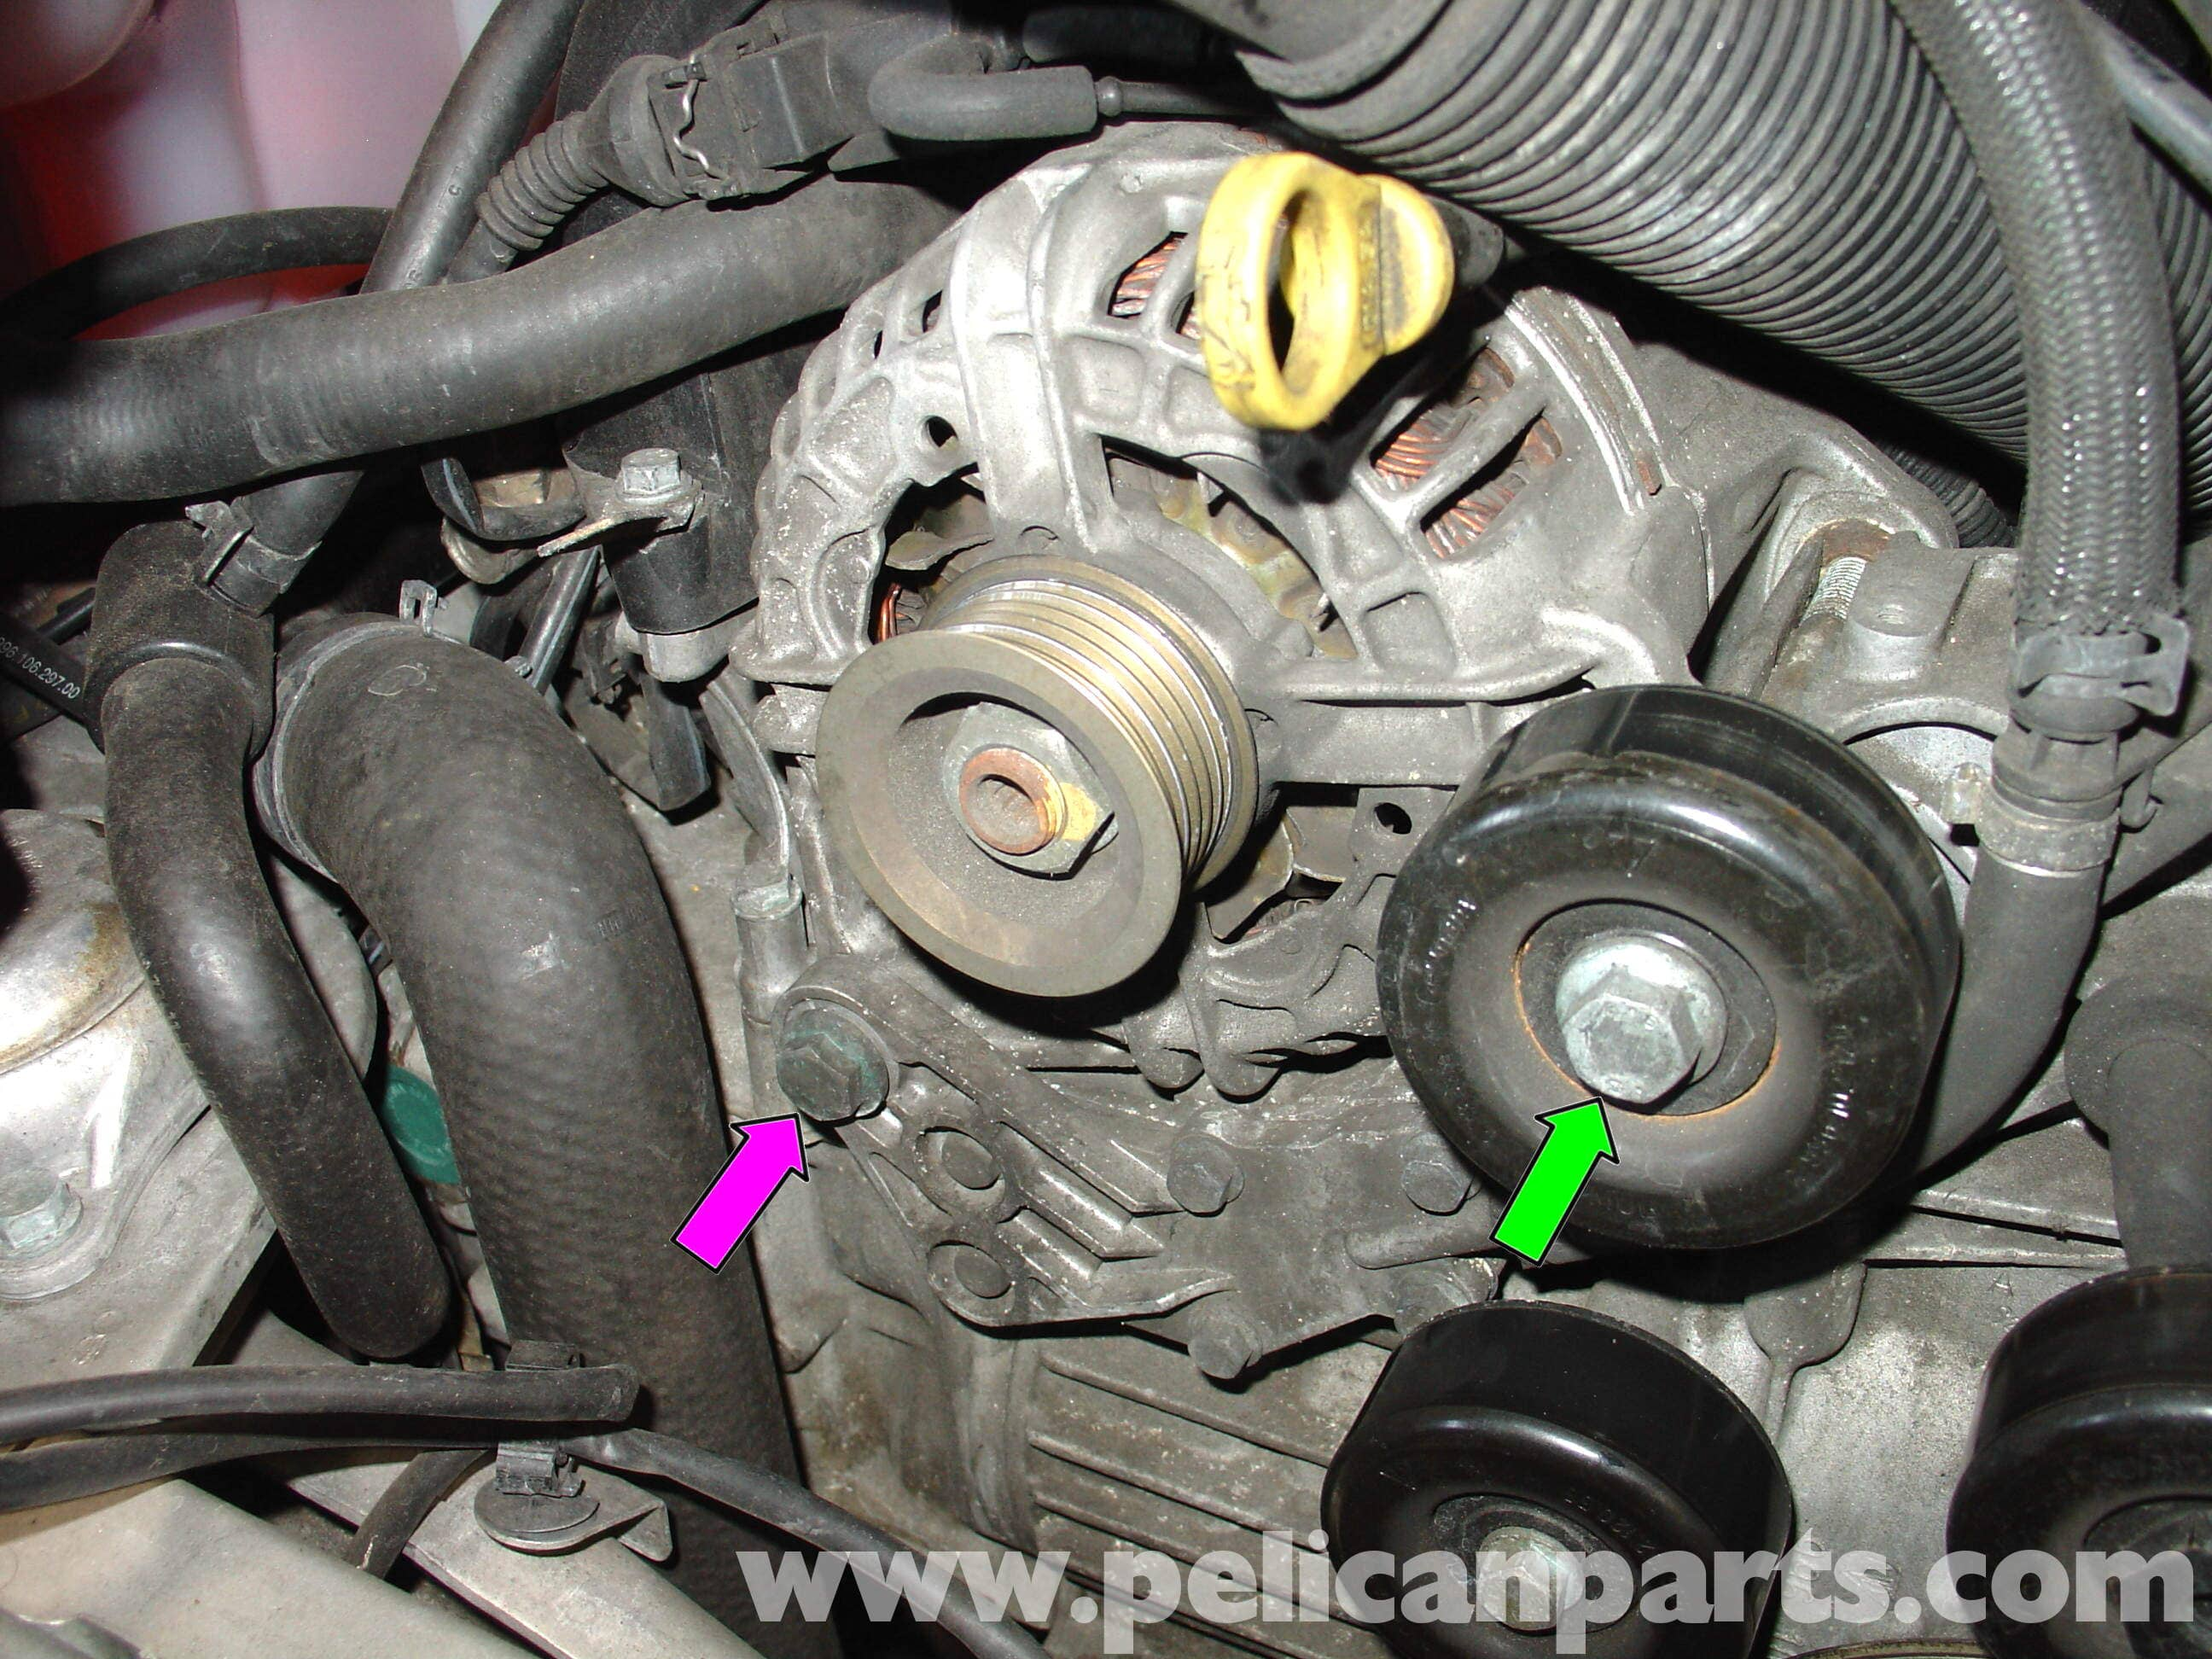 95 Wrangler Wiring Diagram Porsche 911 Carrera Alternator Replacement 996 1998